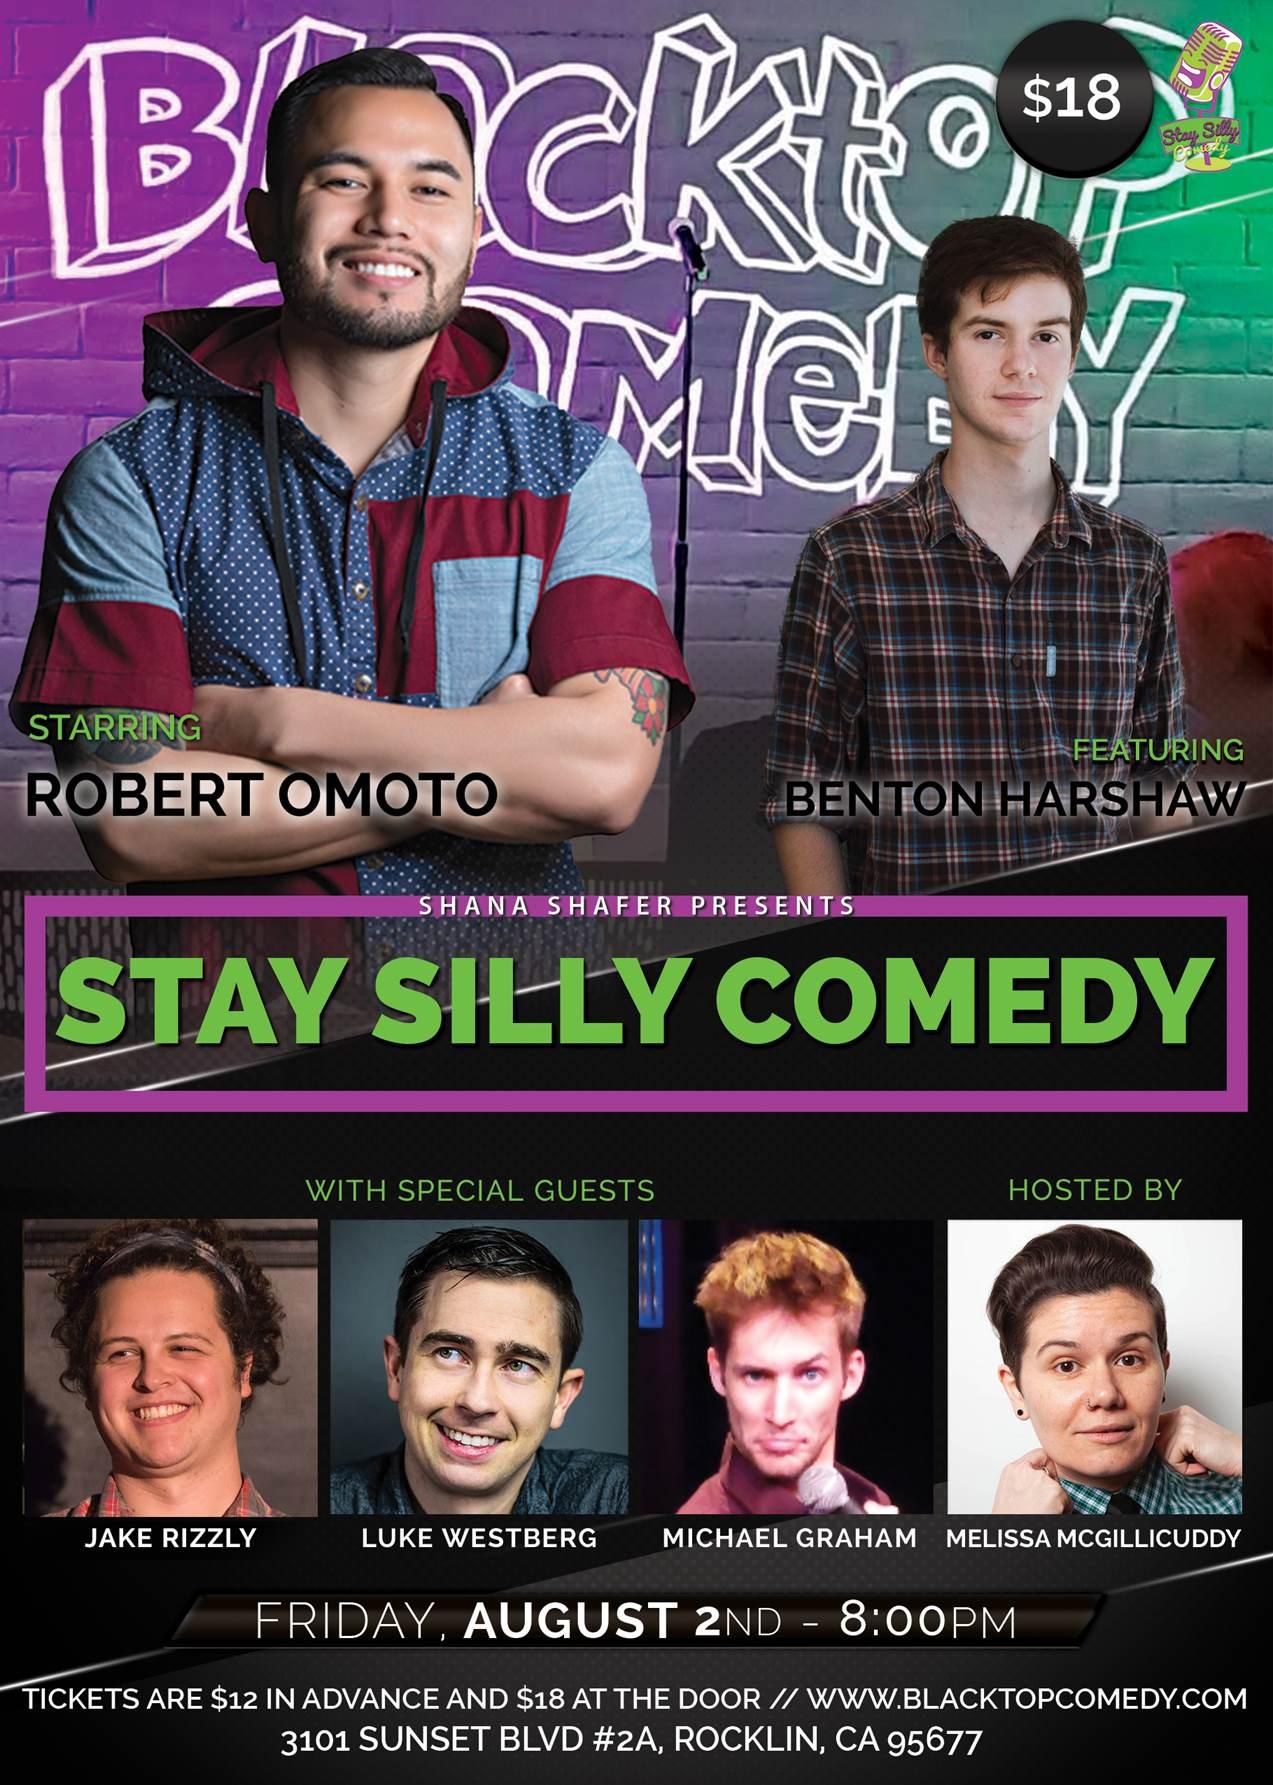 Stay Silly Comedy - Aug 2nd (2) (Copy).jpg